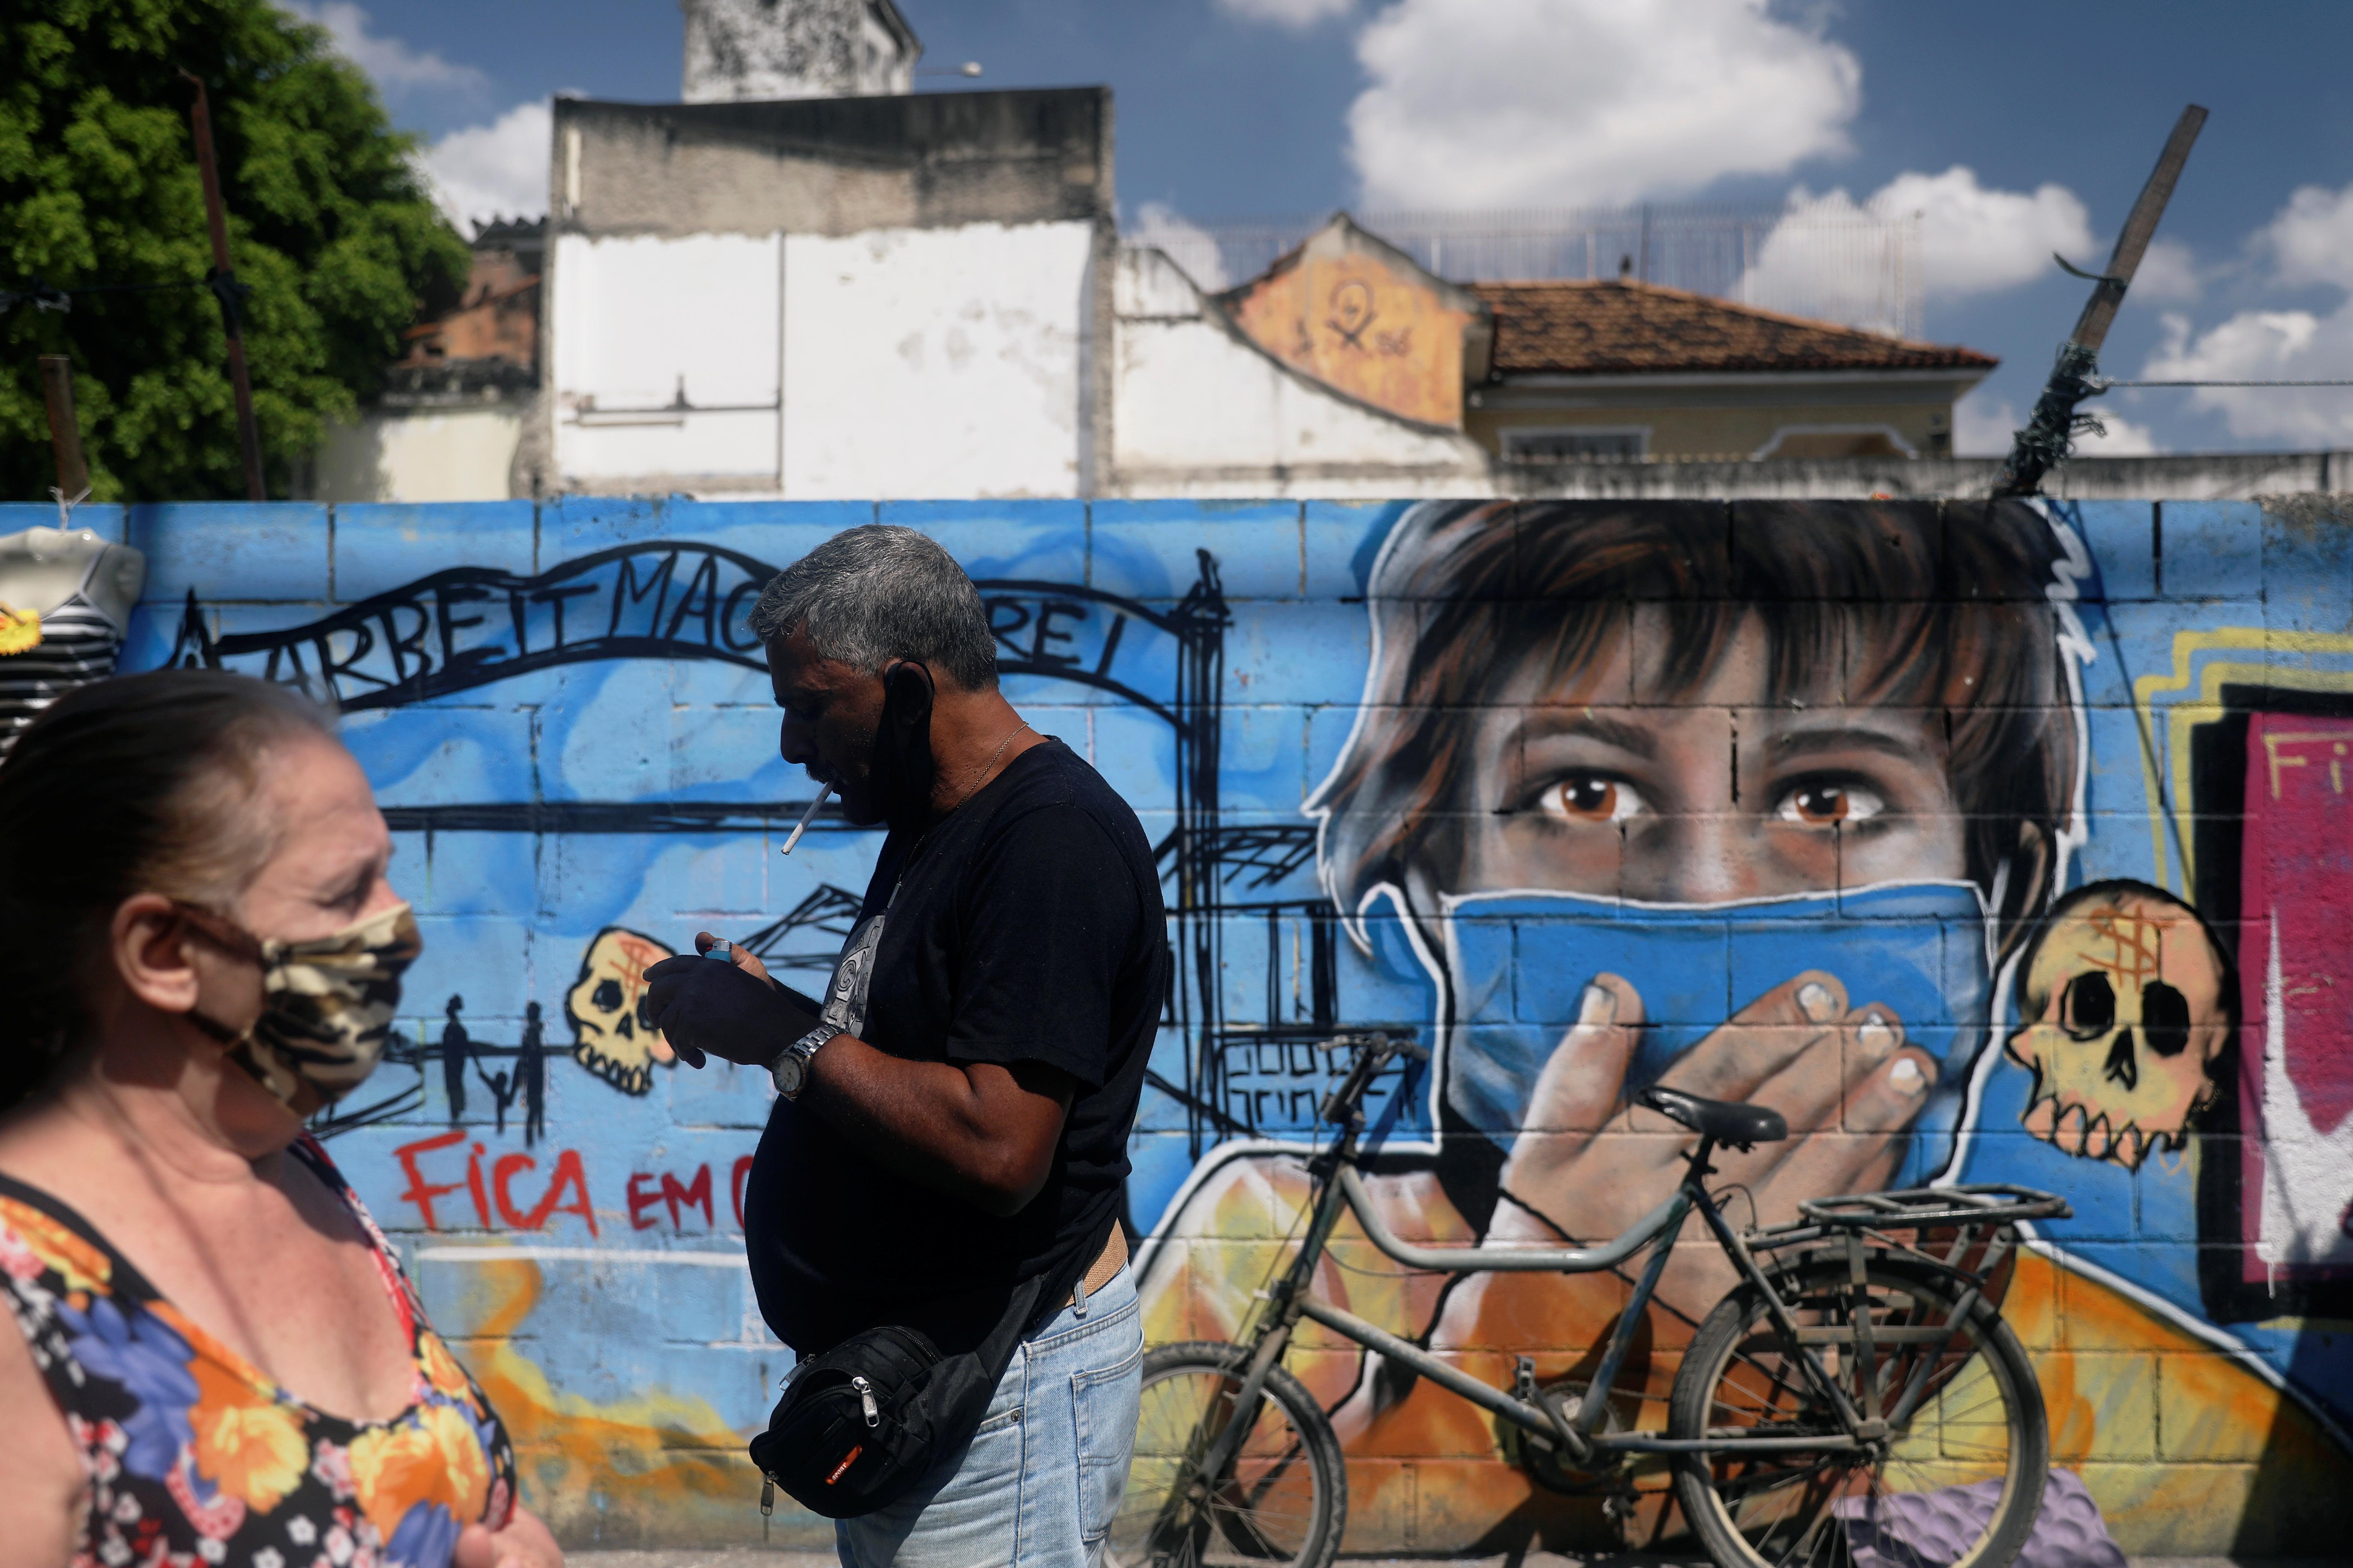 People wearing protective masks walk past a graffiti, following the coronavirus disease (COVID-19) outbreak, in Rio de Janeiro, Brazil September 2, 2020. REUTERS/Pilar Olivares/Files